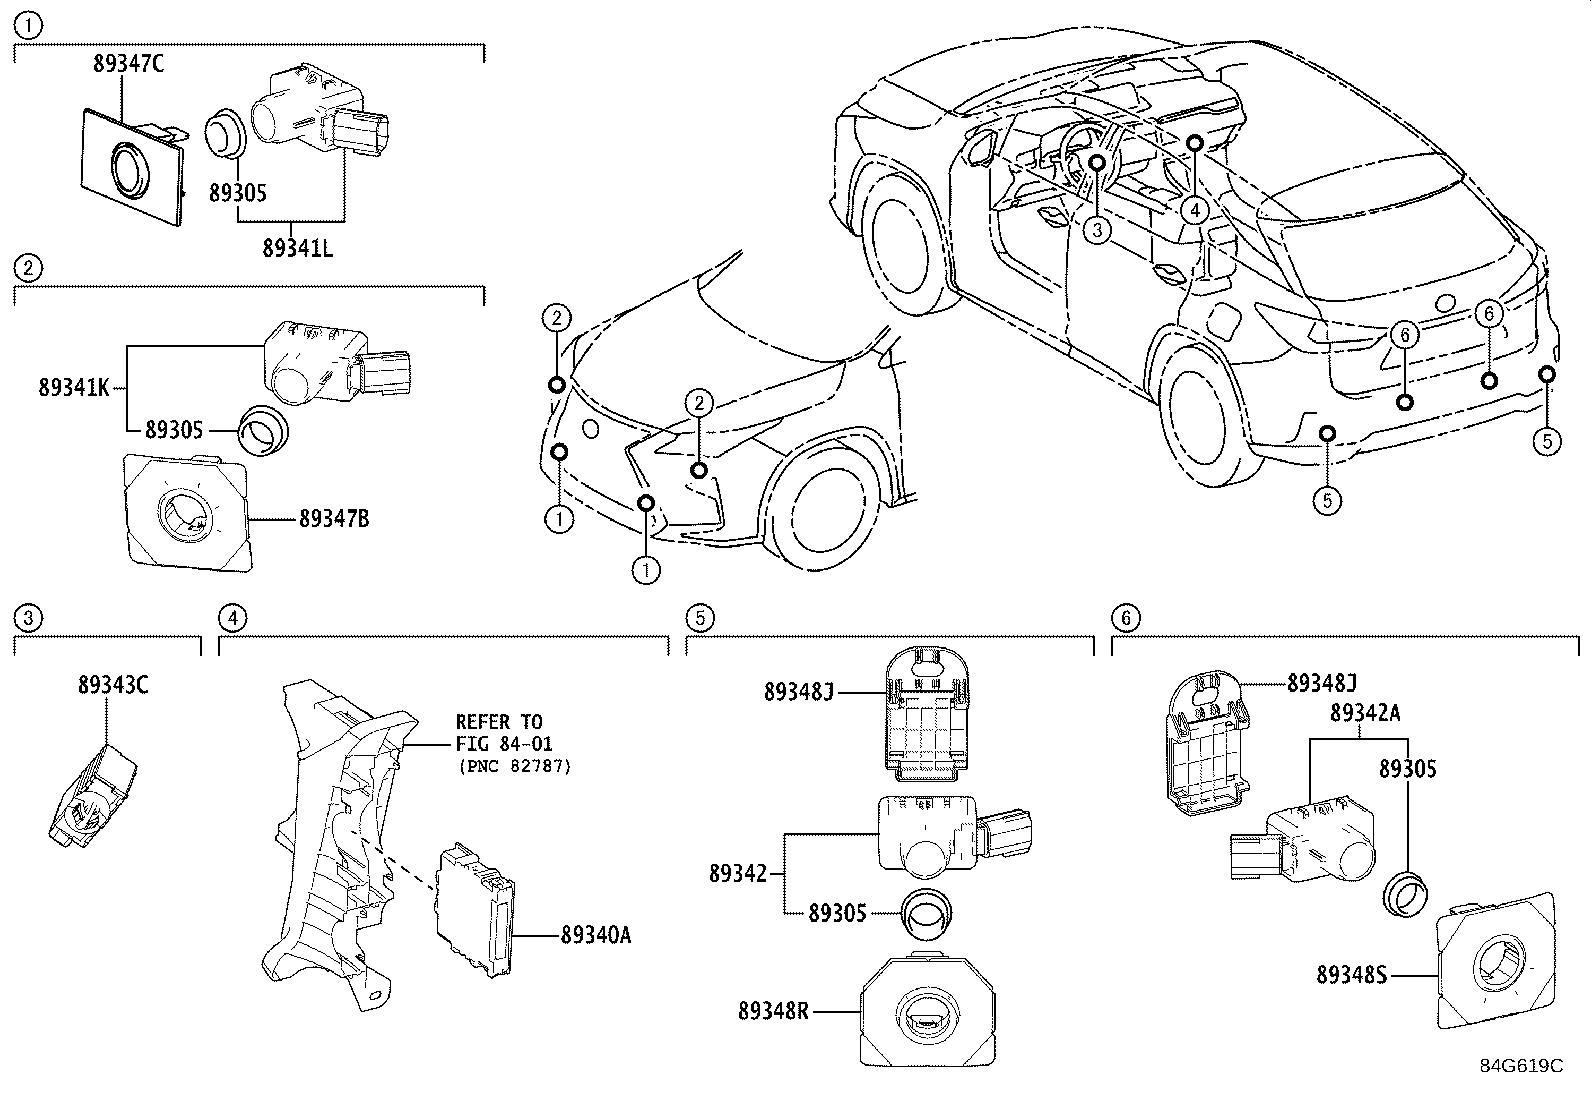 Lexus RX 350 Retainer. Ultrasonic sensor, no. 3